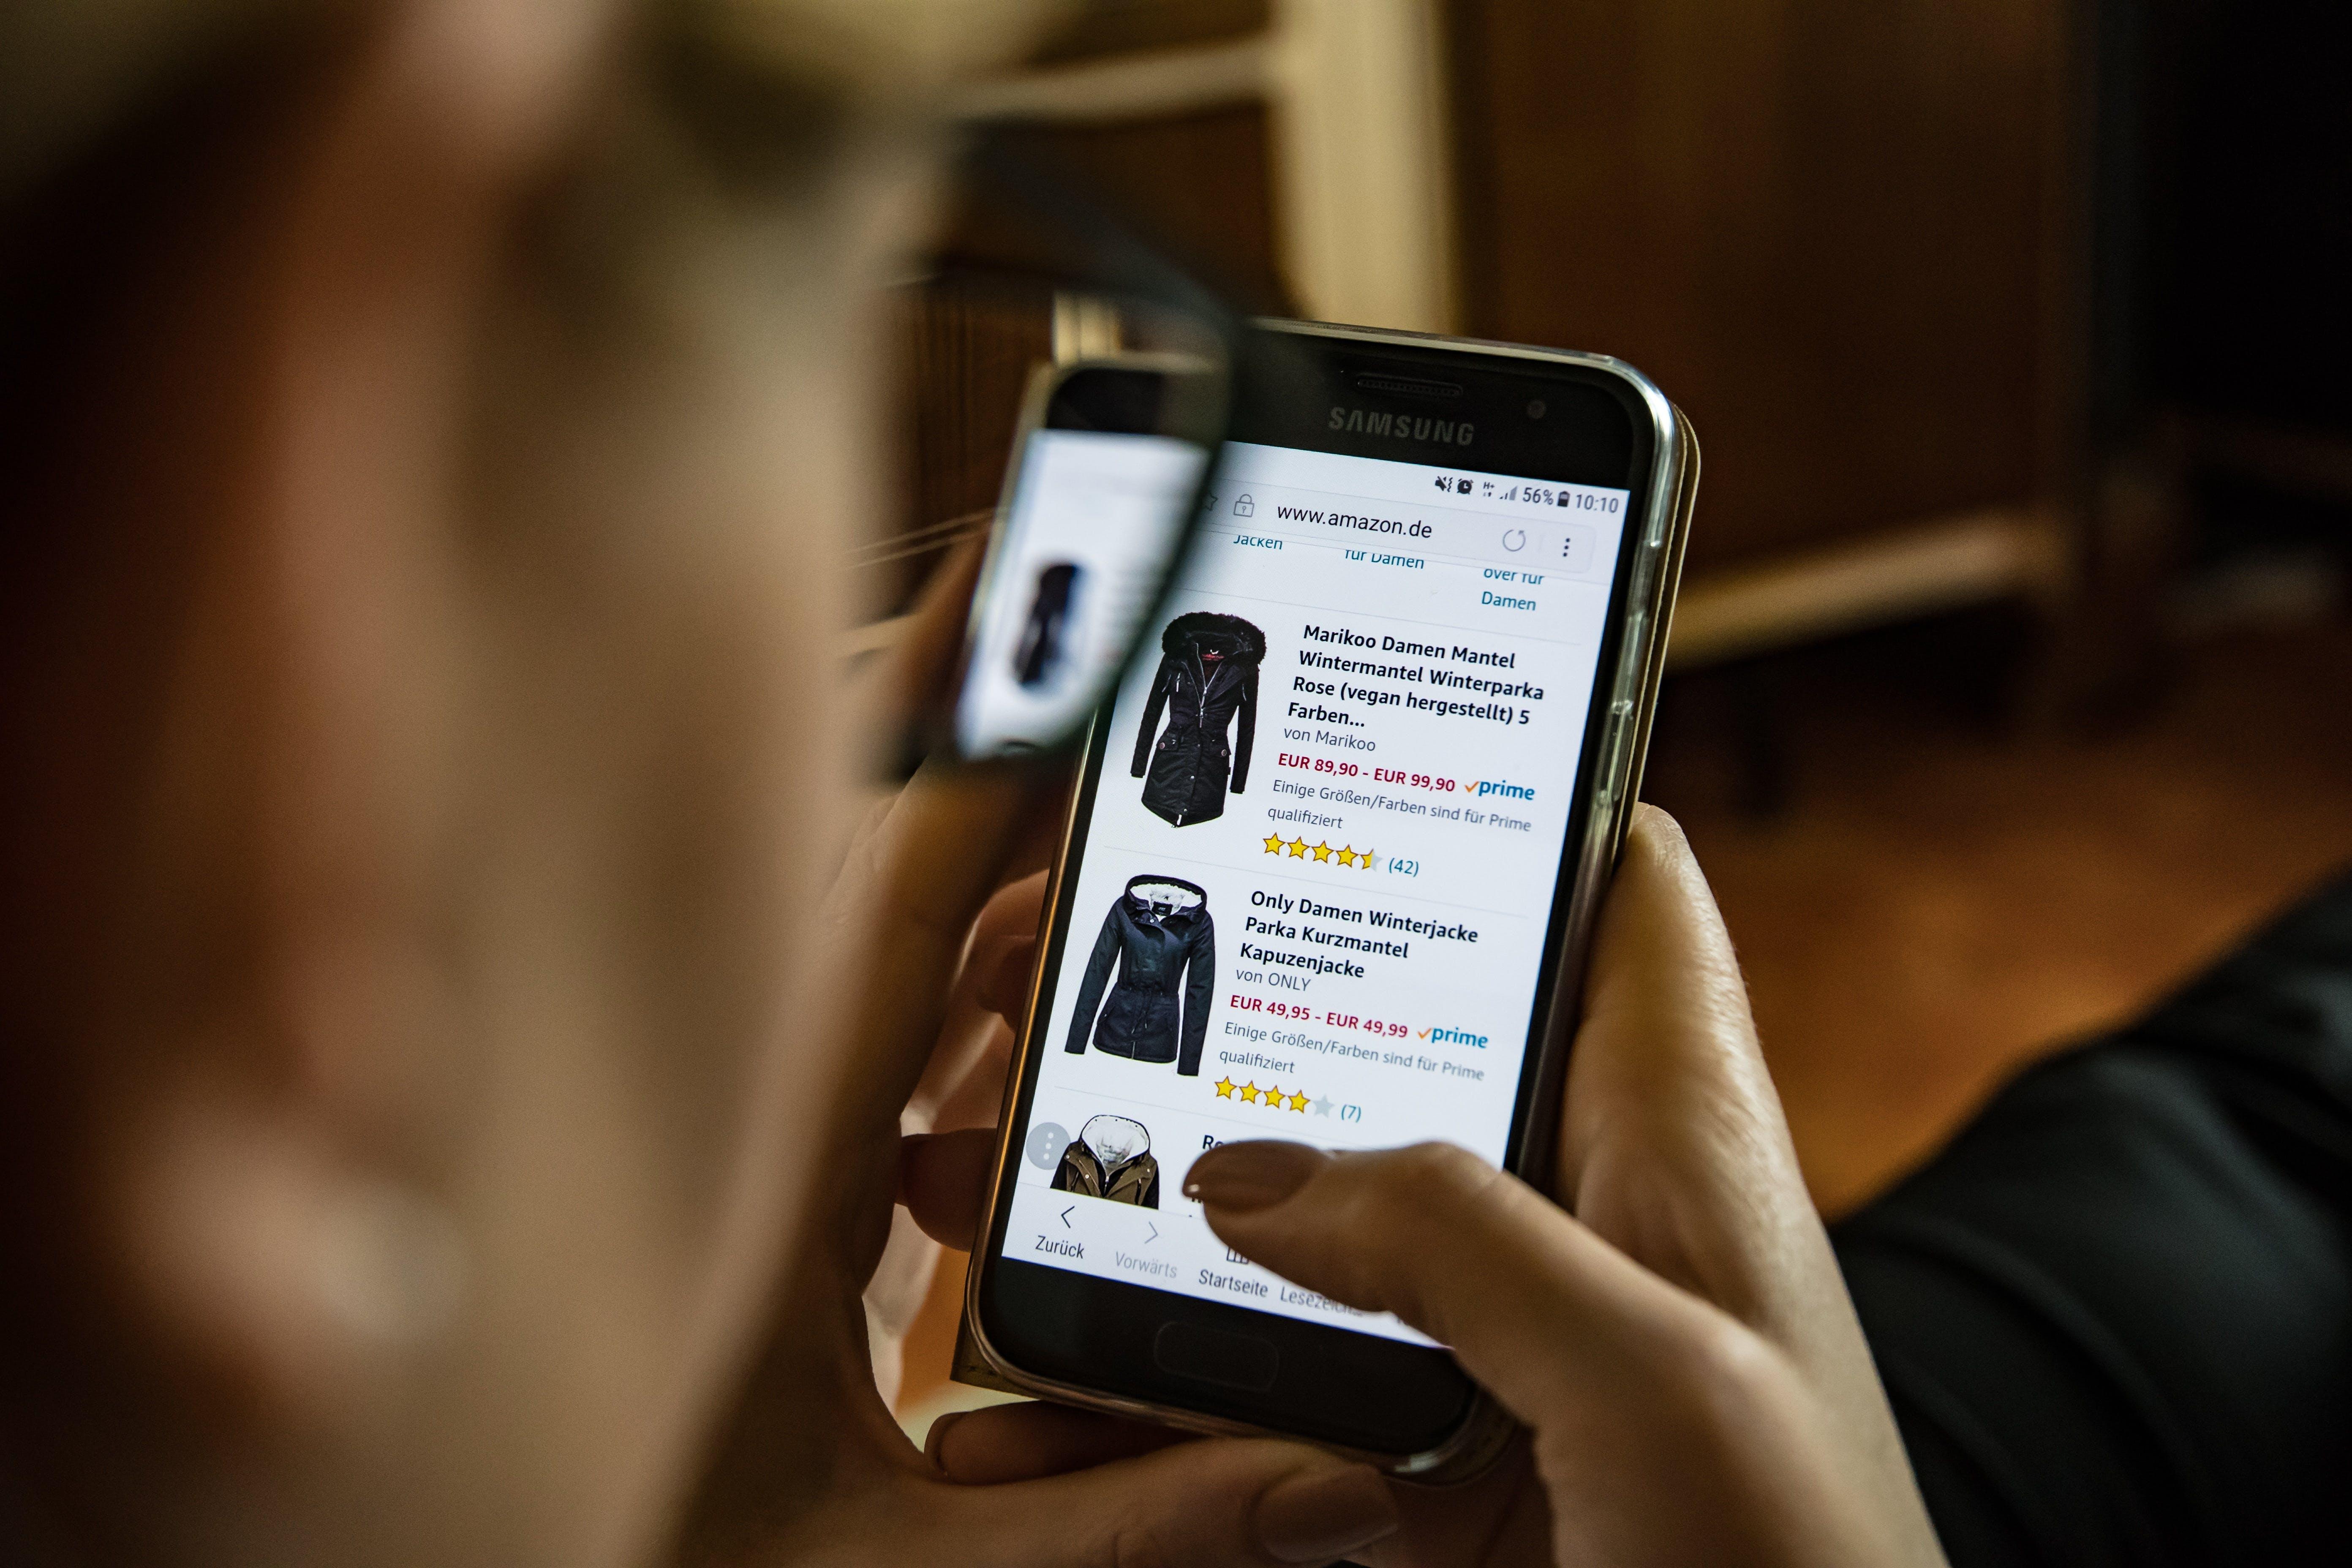 Titelbild-Online-Shopping-Amazon-B2B-Vertrieb-Kleidung-Smartphone-2900303-pixabay-HutchRock